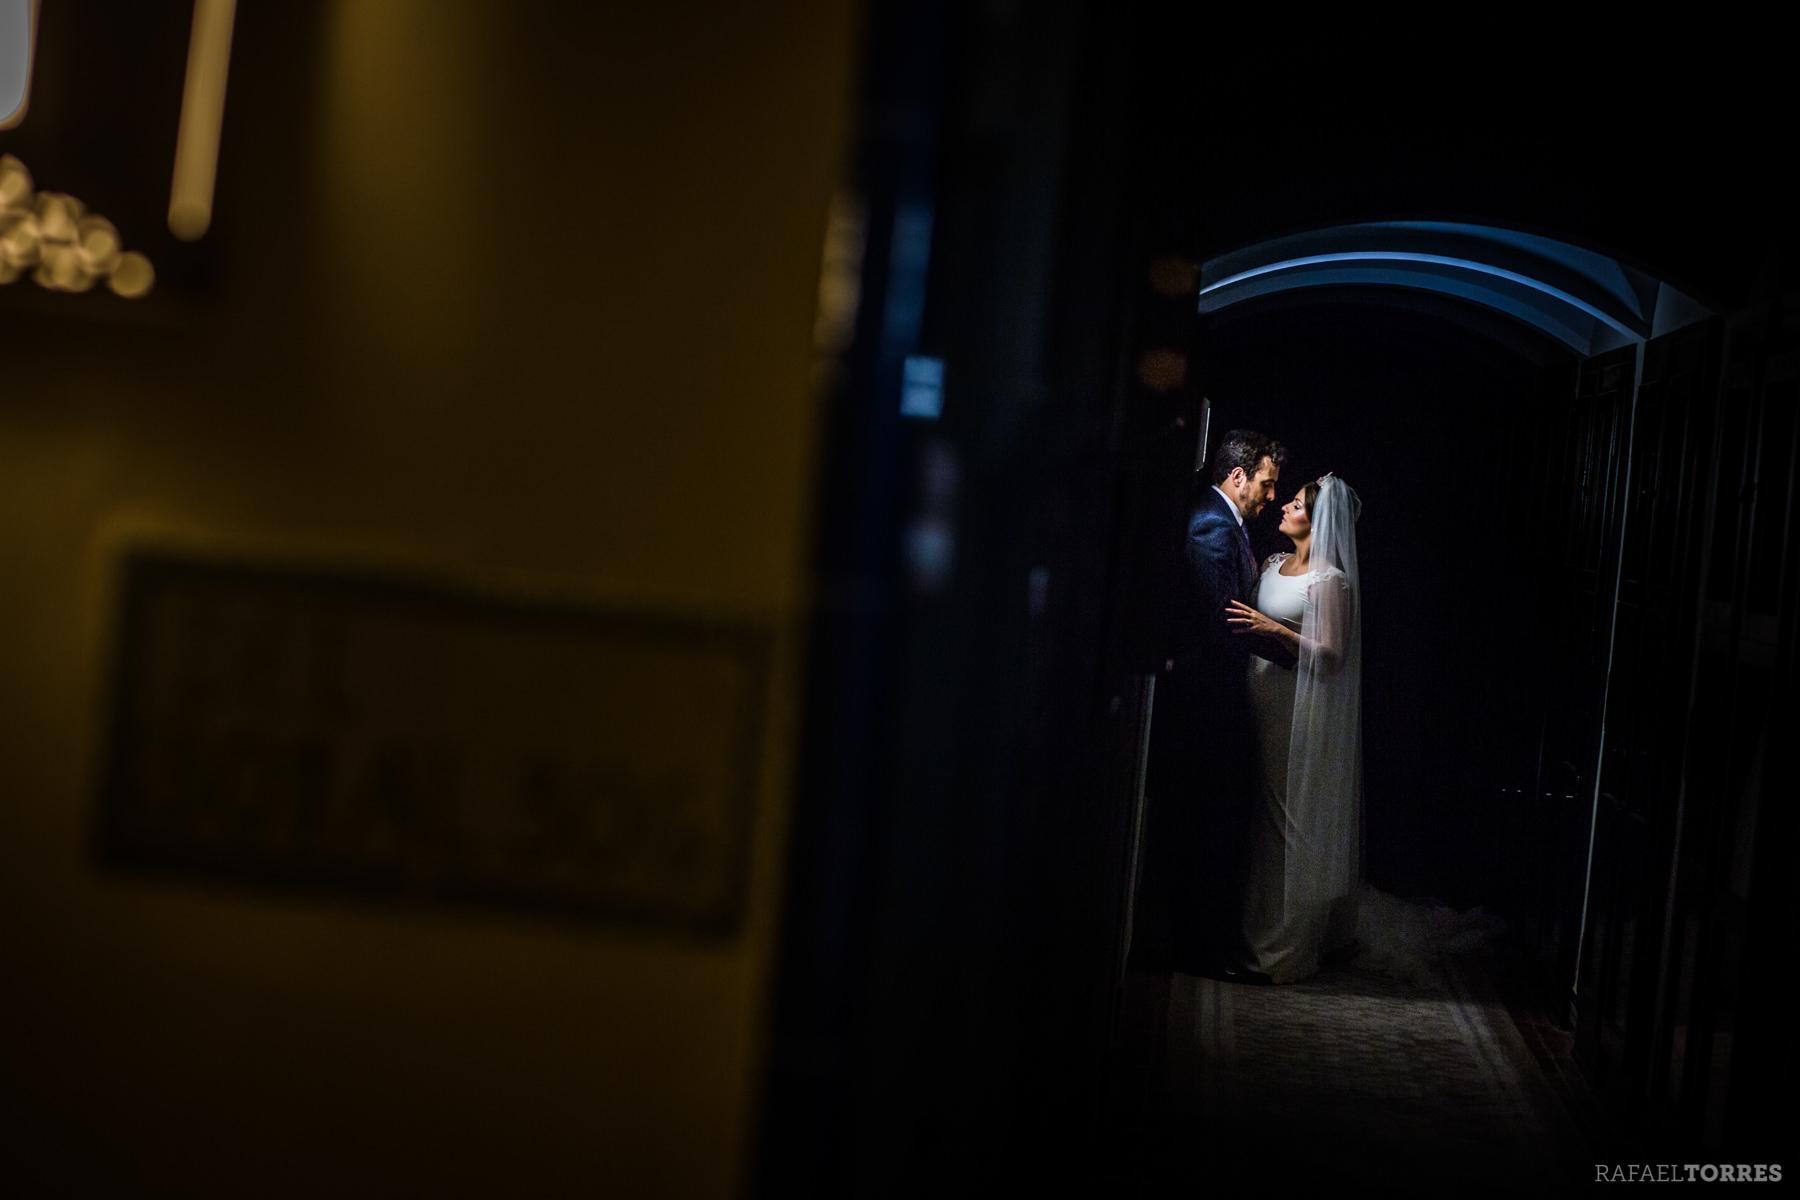 bea-juan-carmona-fotografo-boda-en-sevilla-rafael-torres-photo-46.jpg